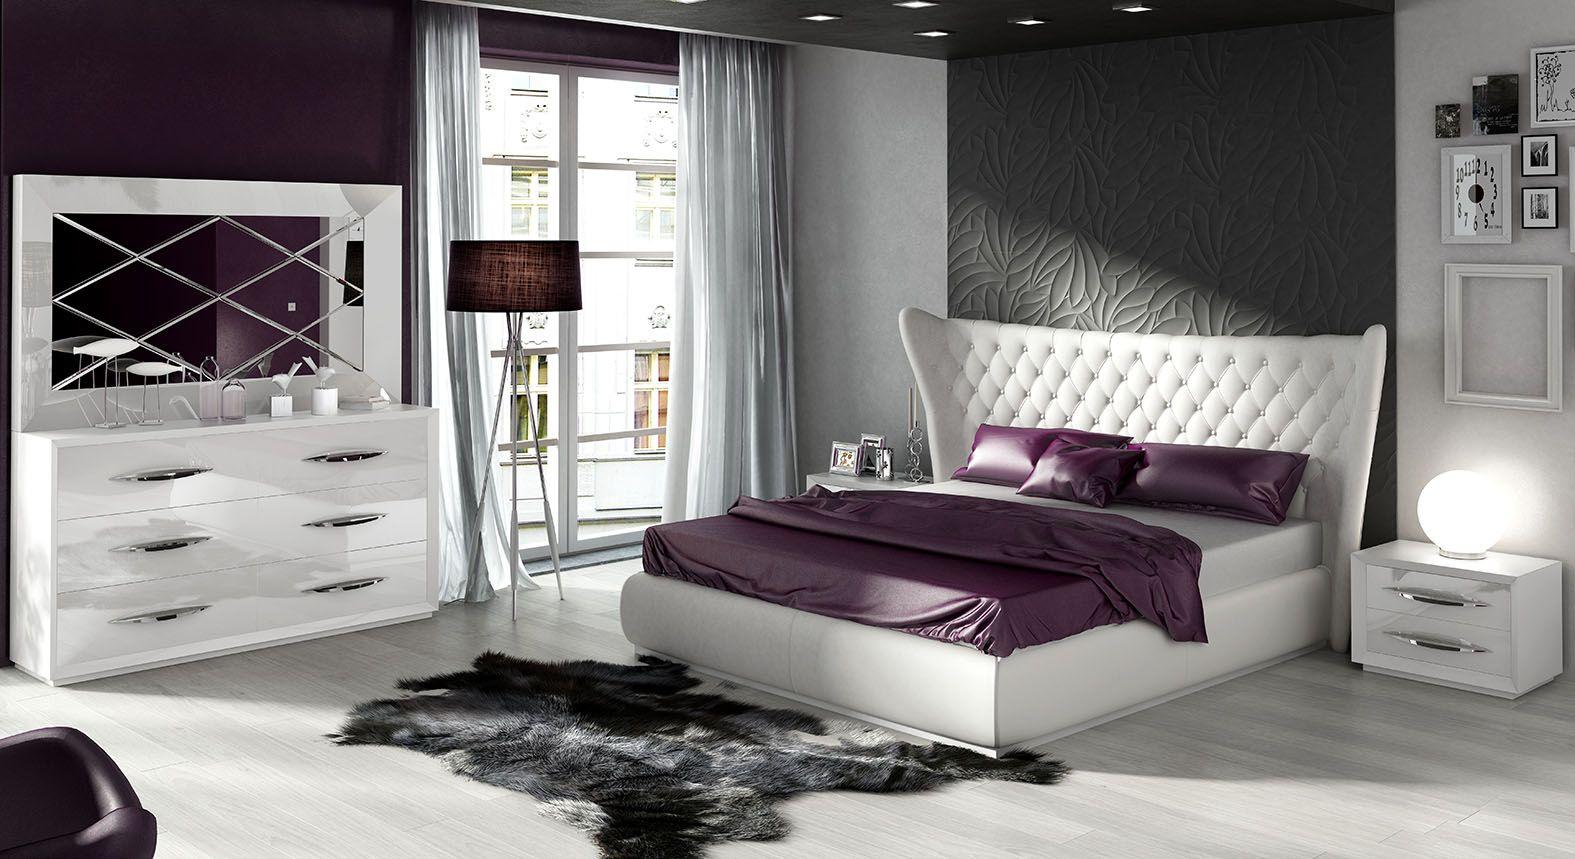 Dormitorio de Matrimonio Completo Tapizado